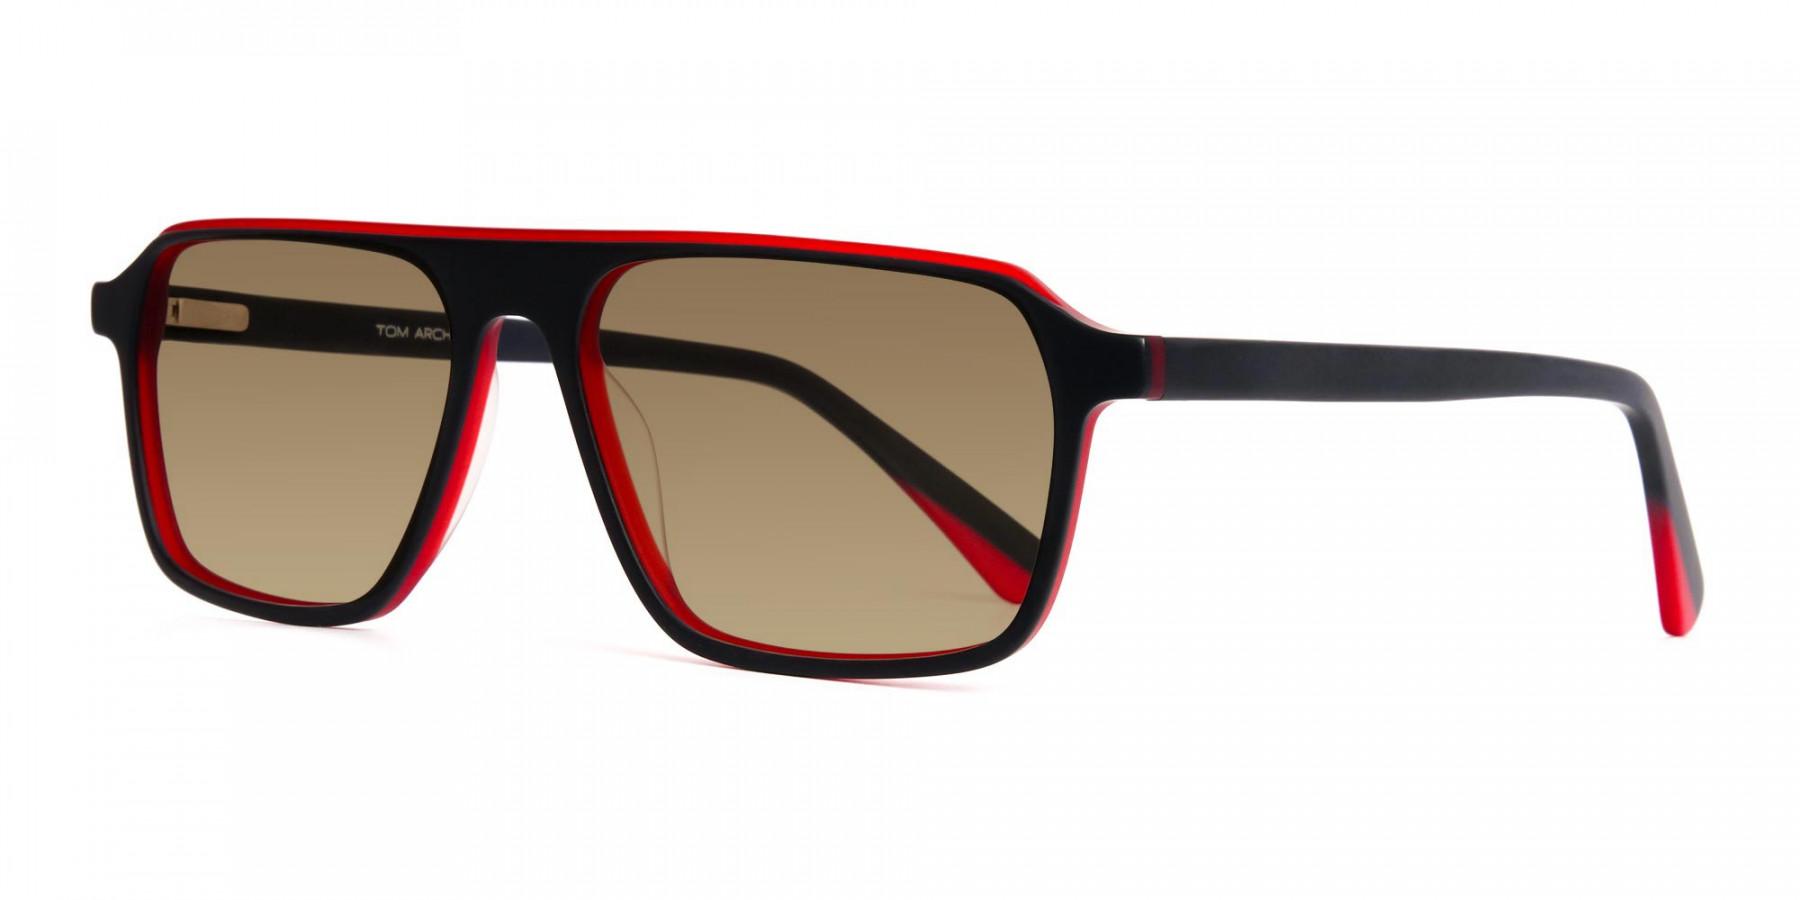 black-and-red-rectangular-full-rim-brown-tinted-sunglasses-frames-3